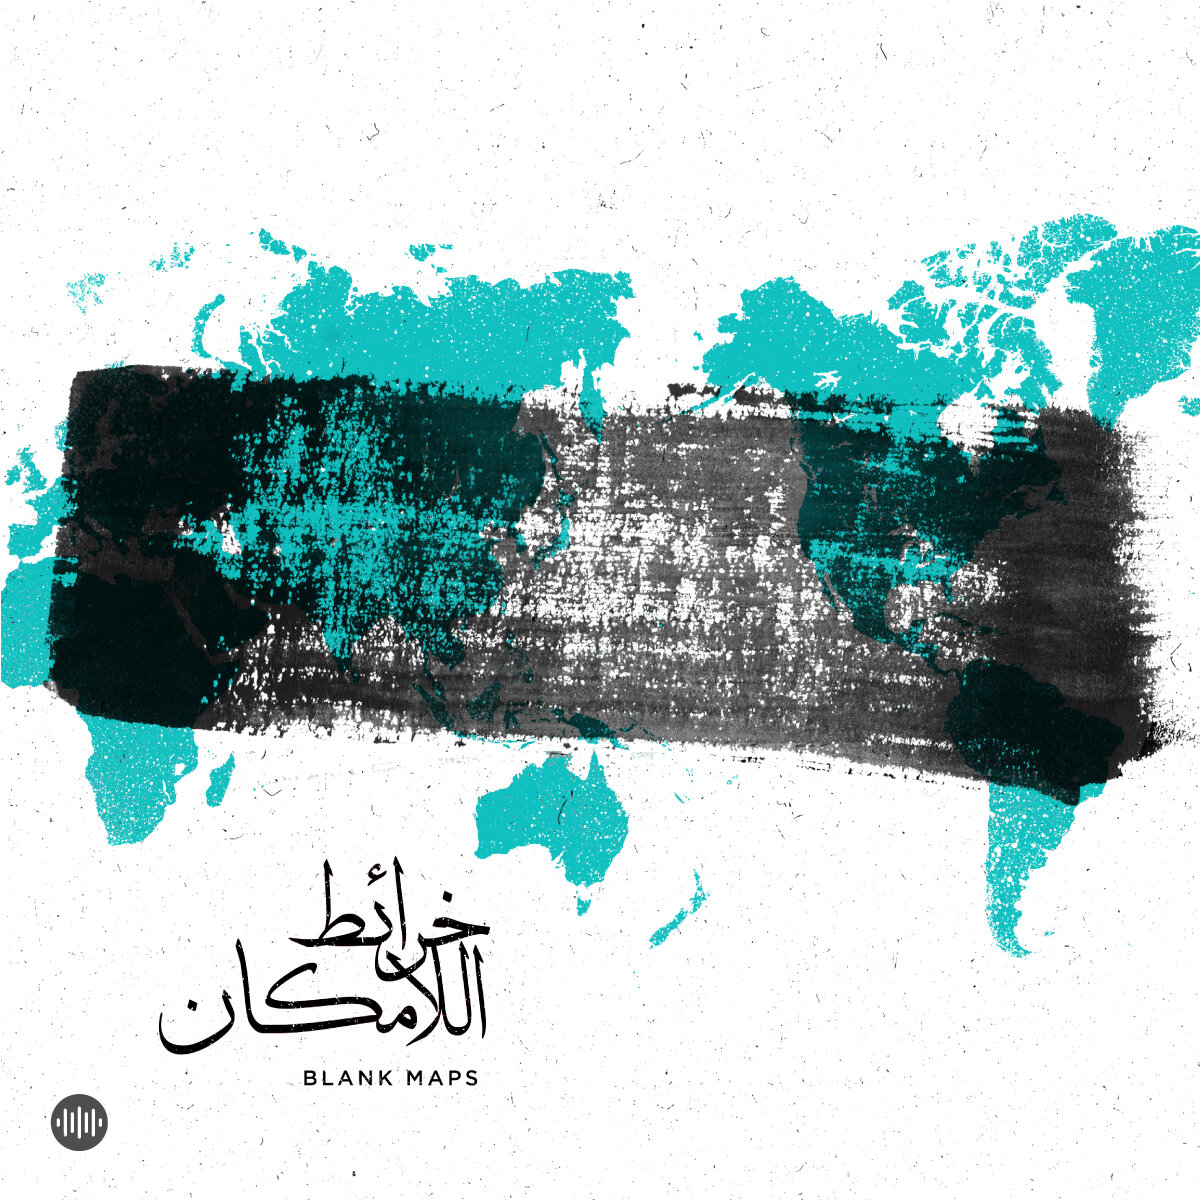 Blank Maps | خرائط اللامكان